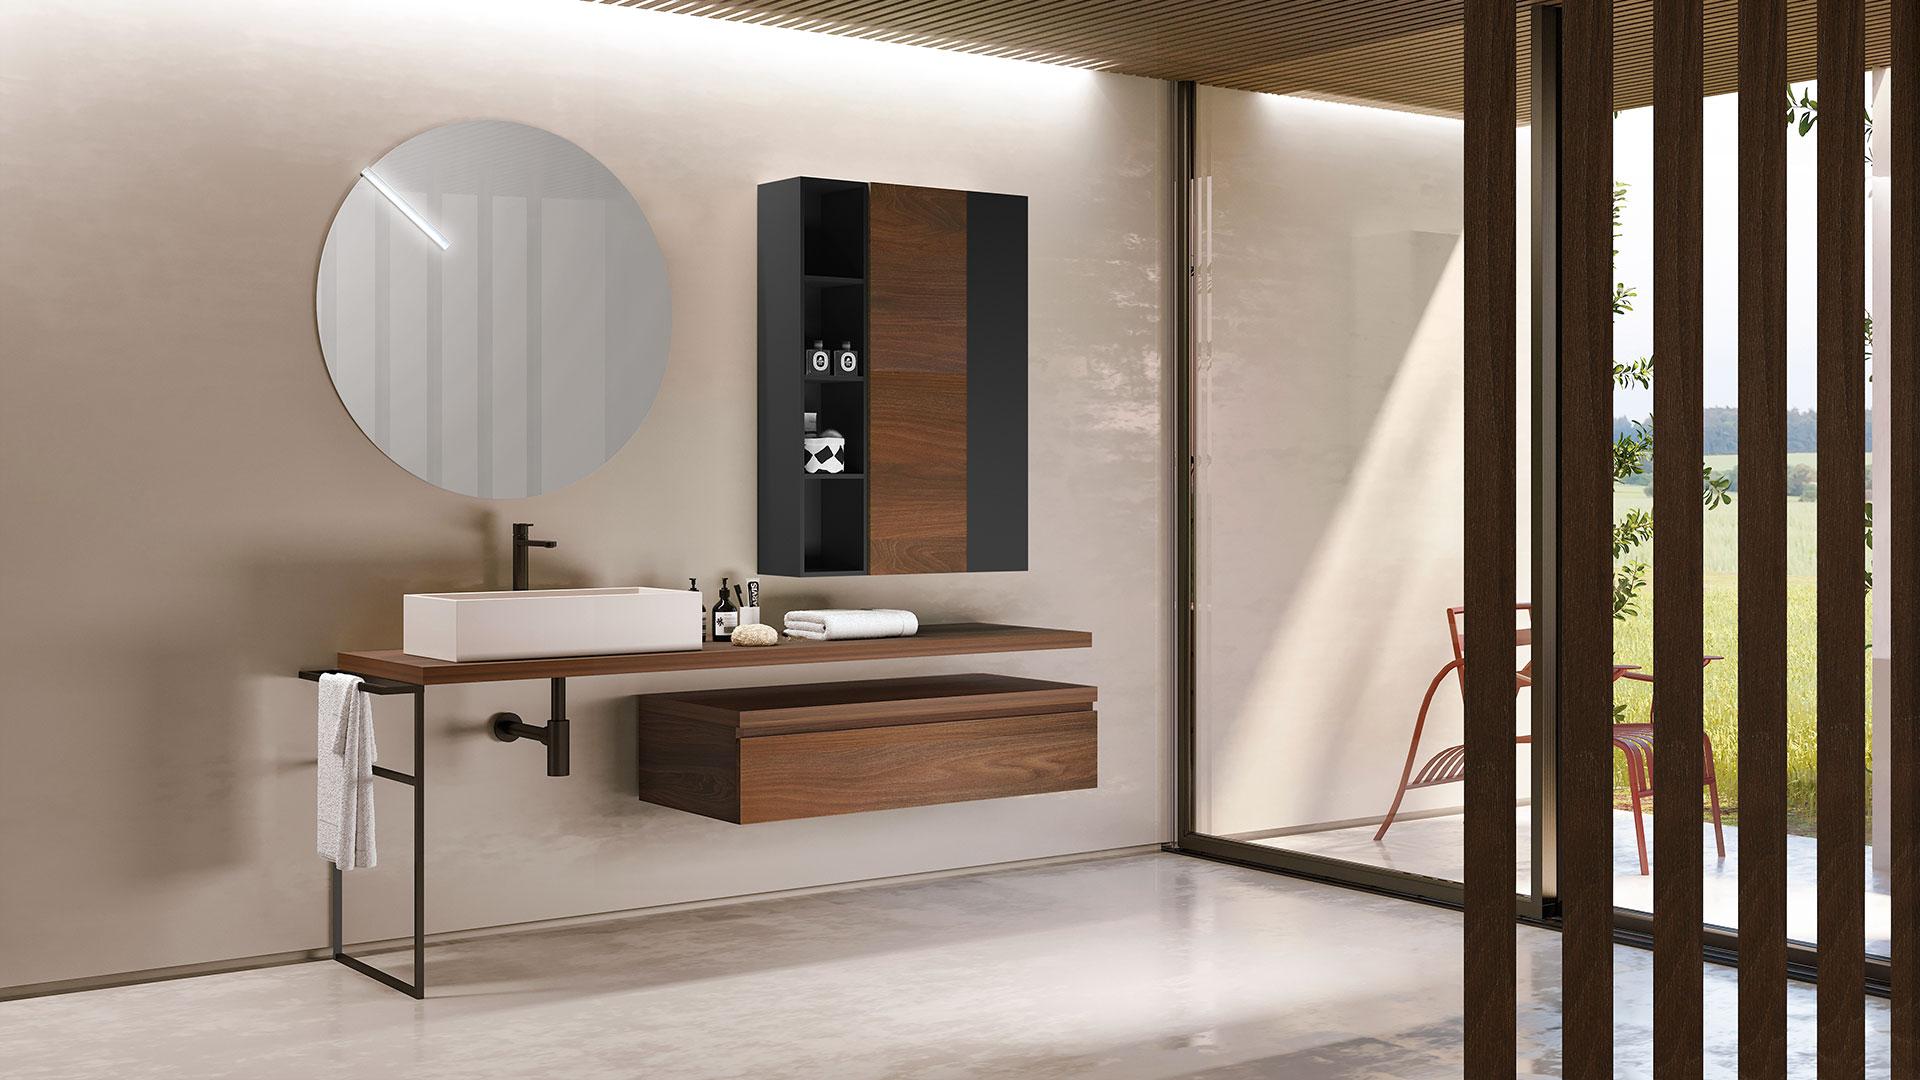 Bathroom Happy 03 - Licor Design